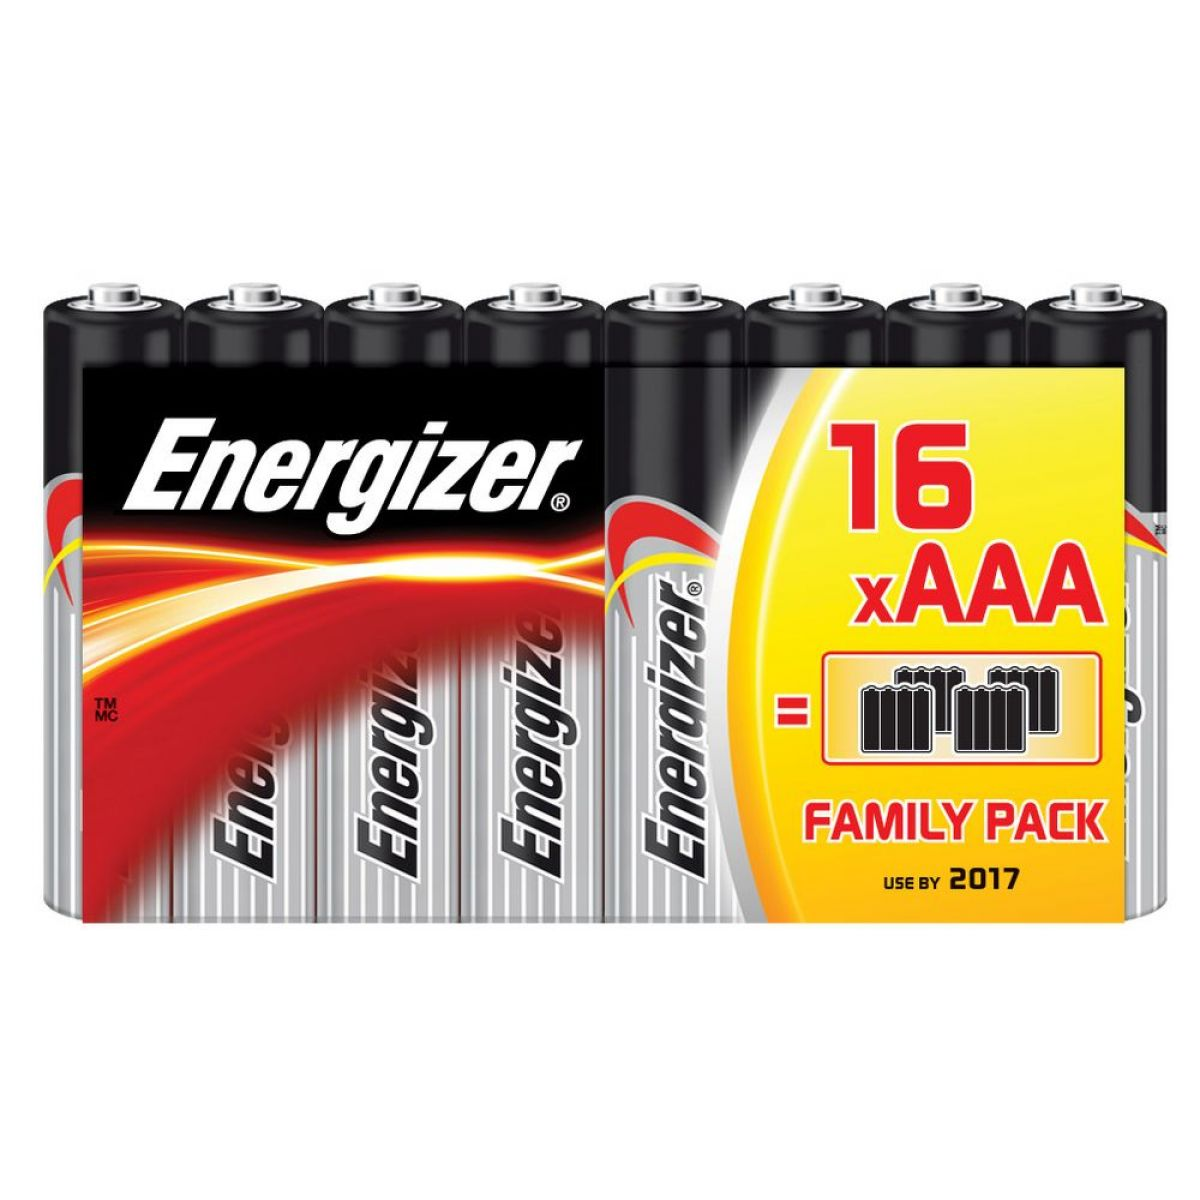 Energizer Alkaline Power AAA 16pack